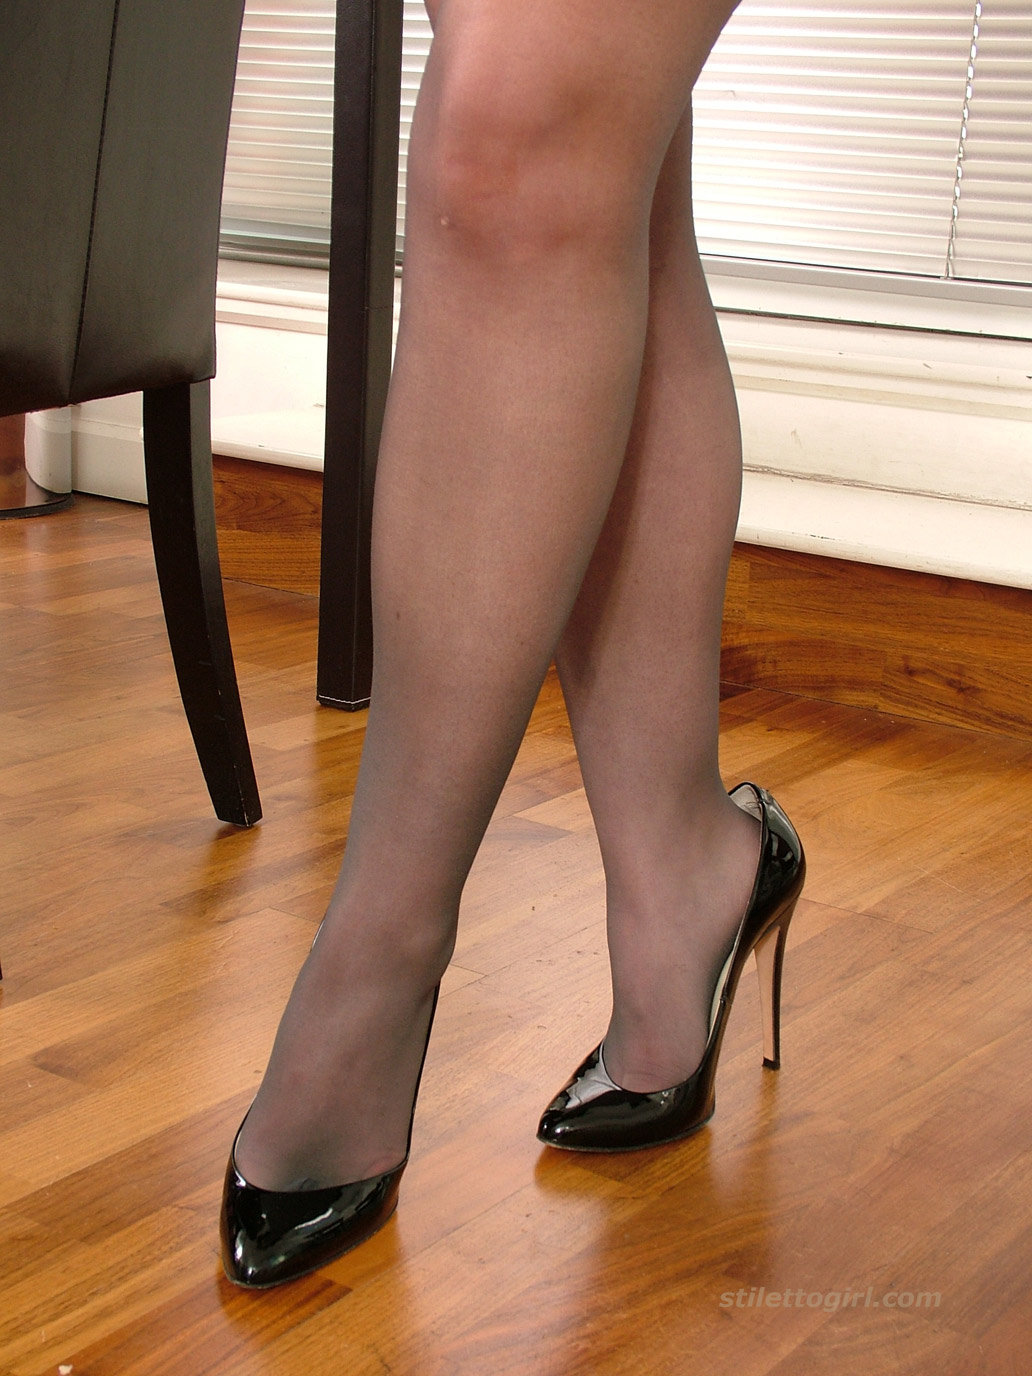 Porn girl free pantyhose high heels ebony